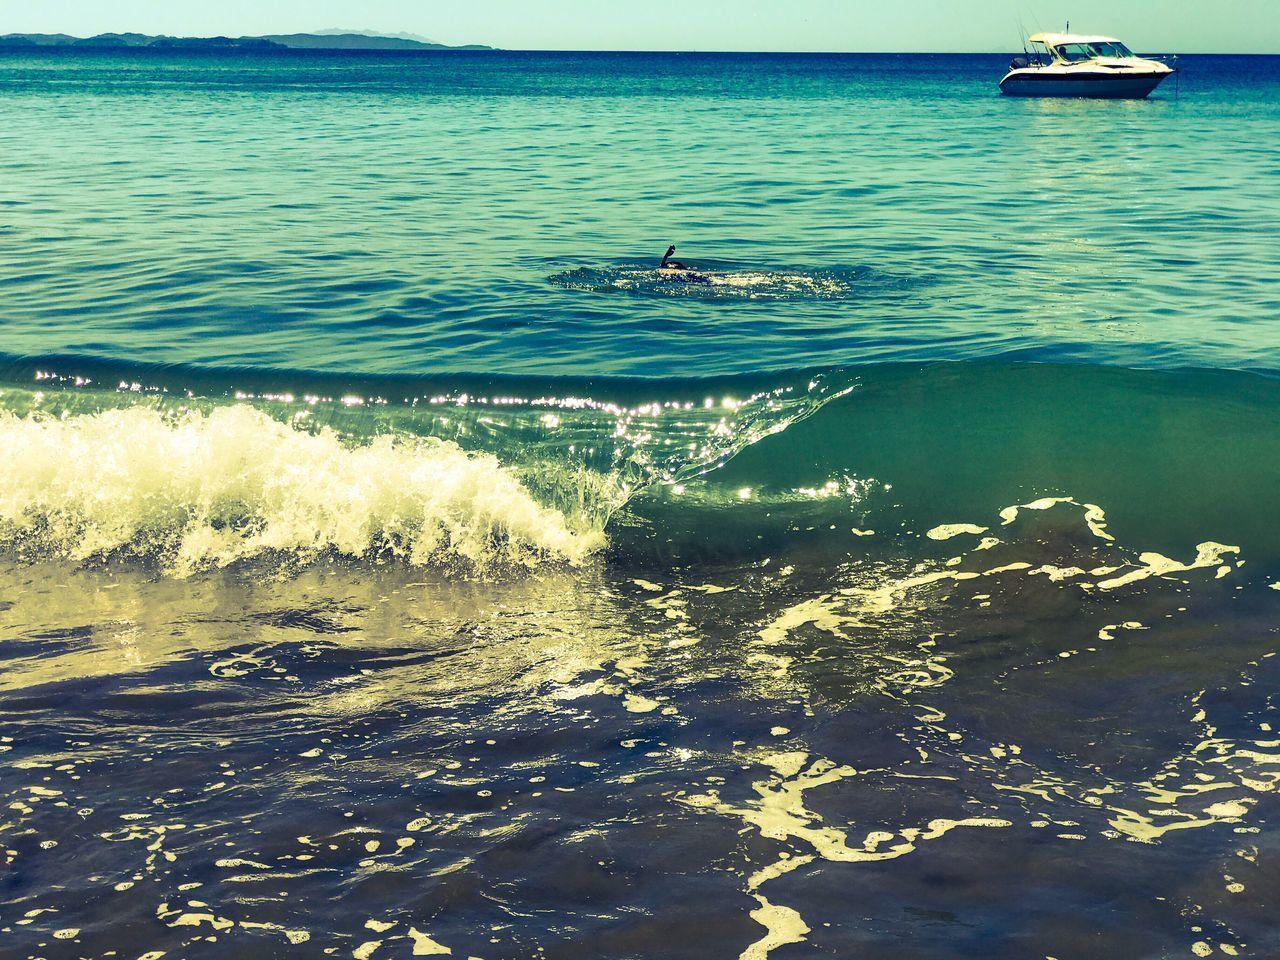 Sea Water Wave Outdoors Nature Beach Summertime Fun Beach Life Exploring Landscape_Collection Beachbum